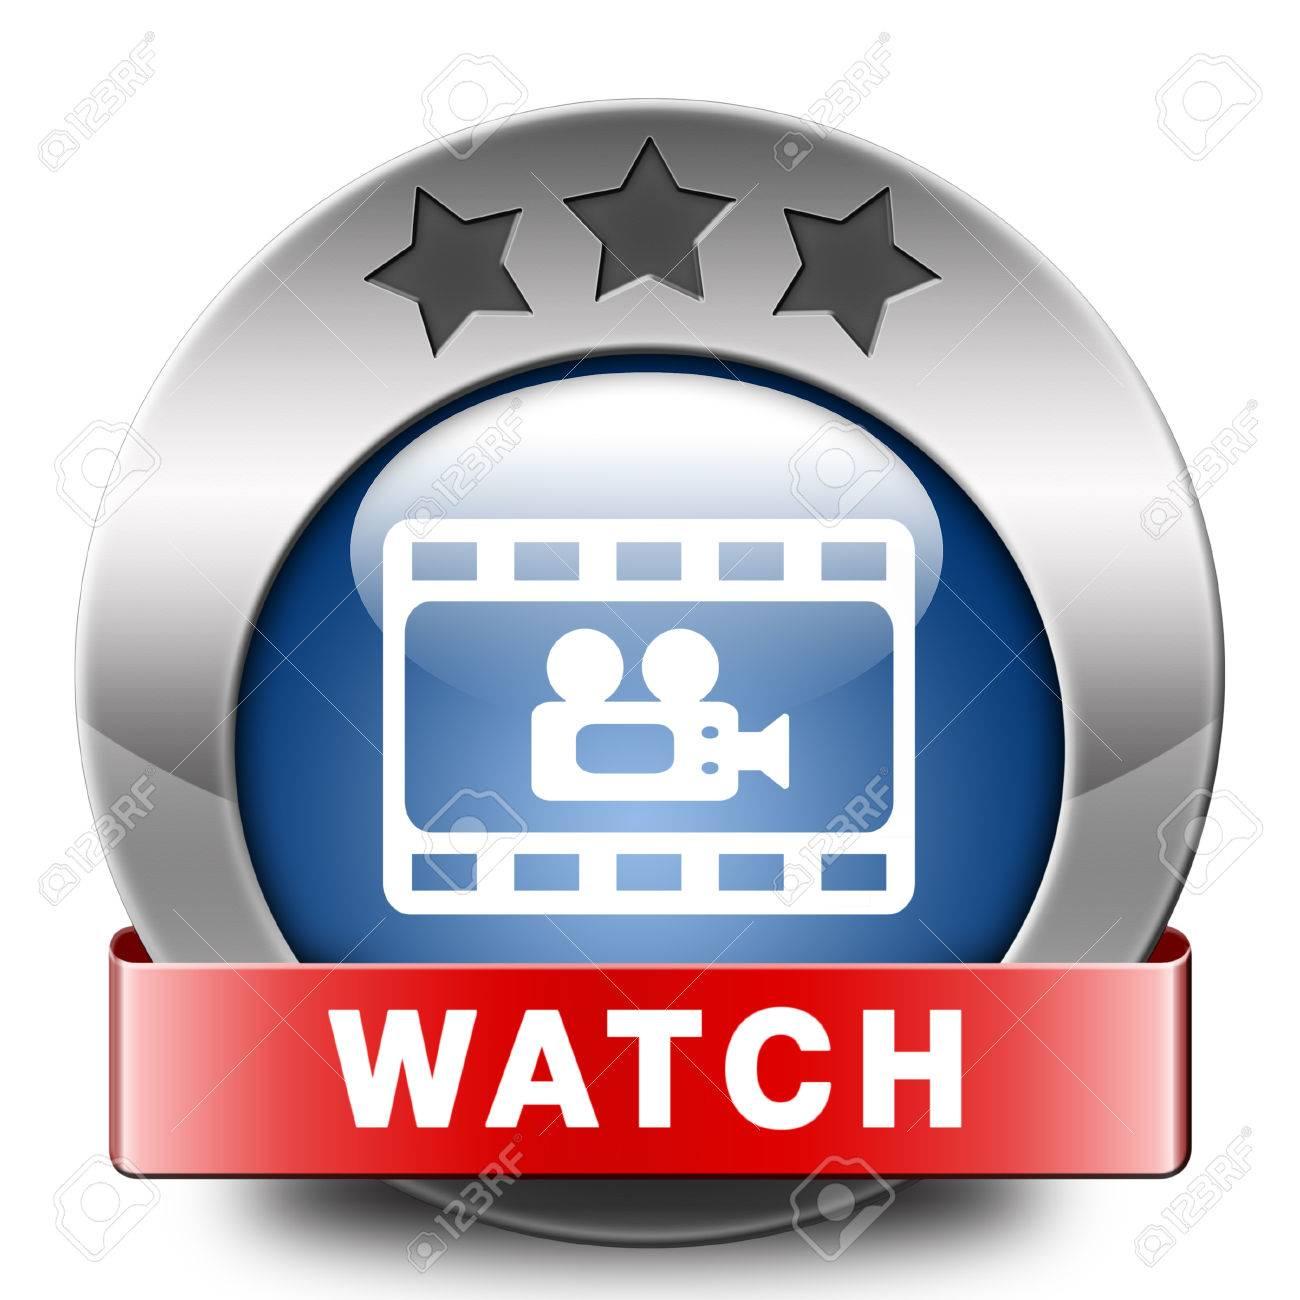 Watch the clip watch video online 7